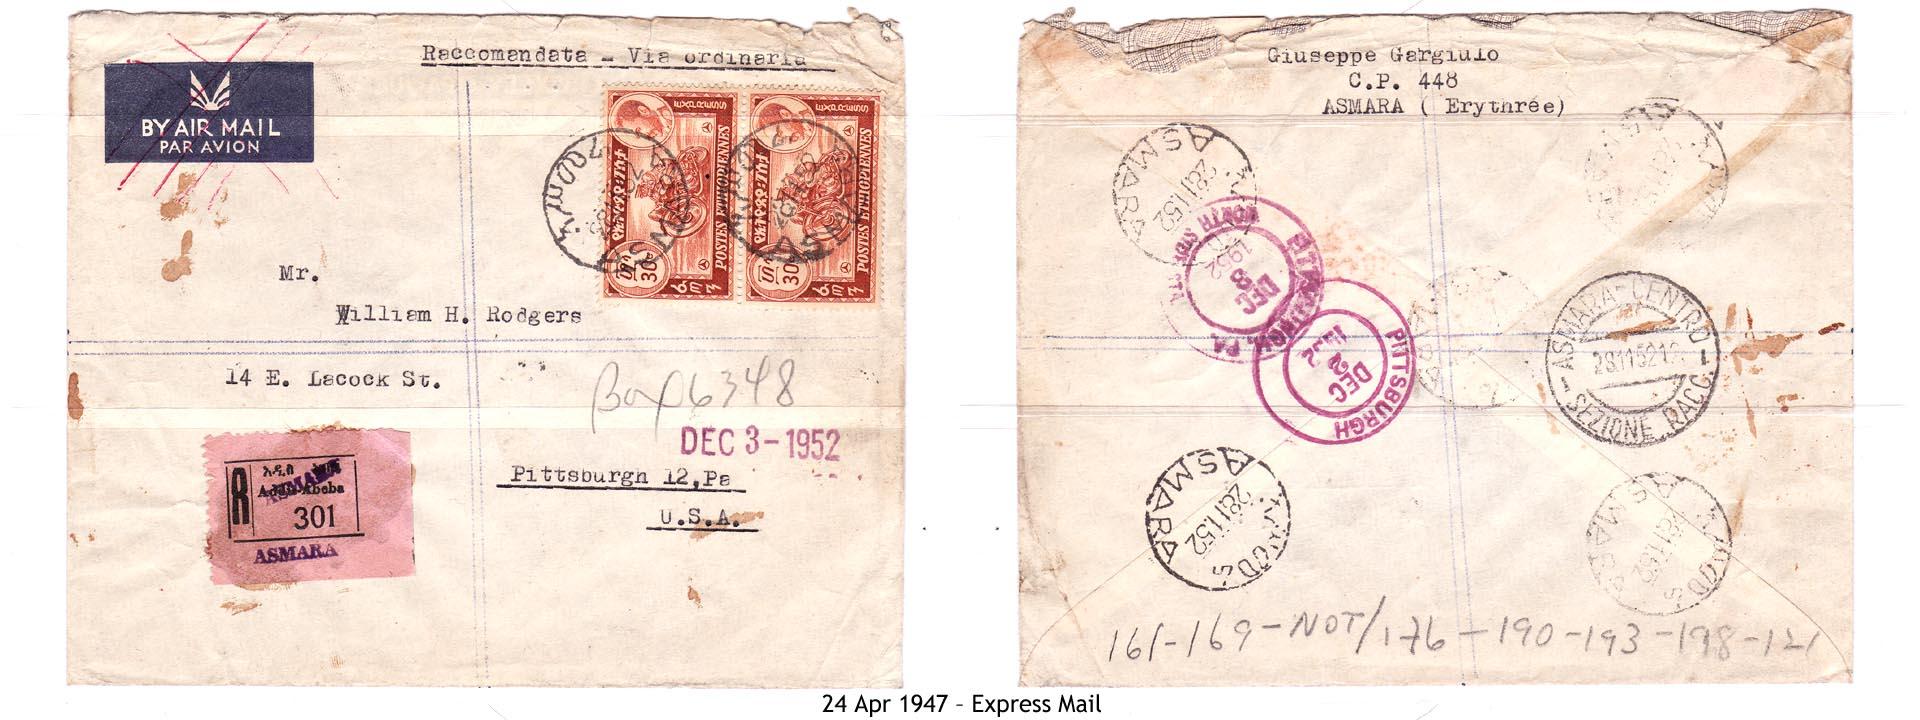 19470424 – Express Mail